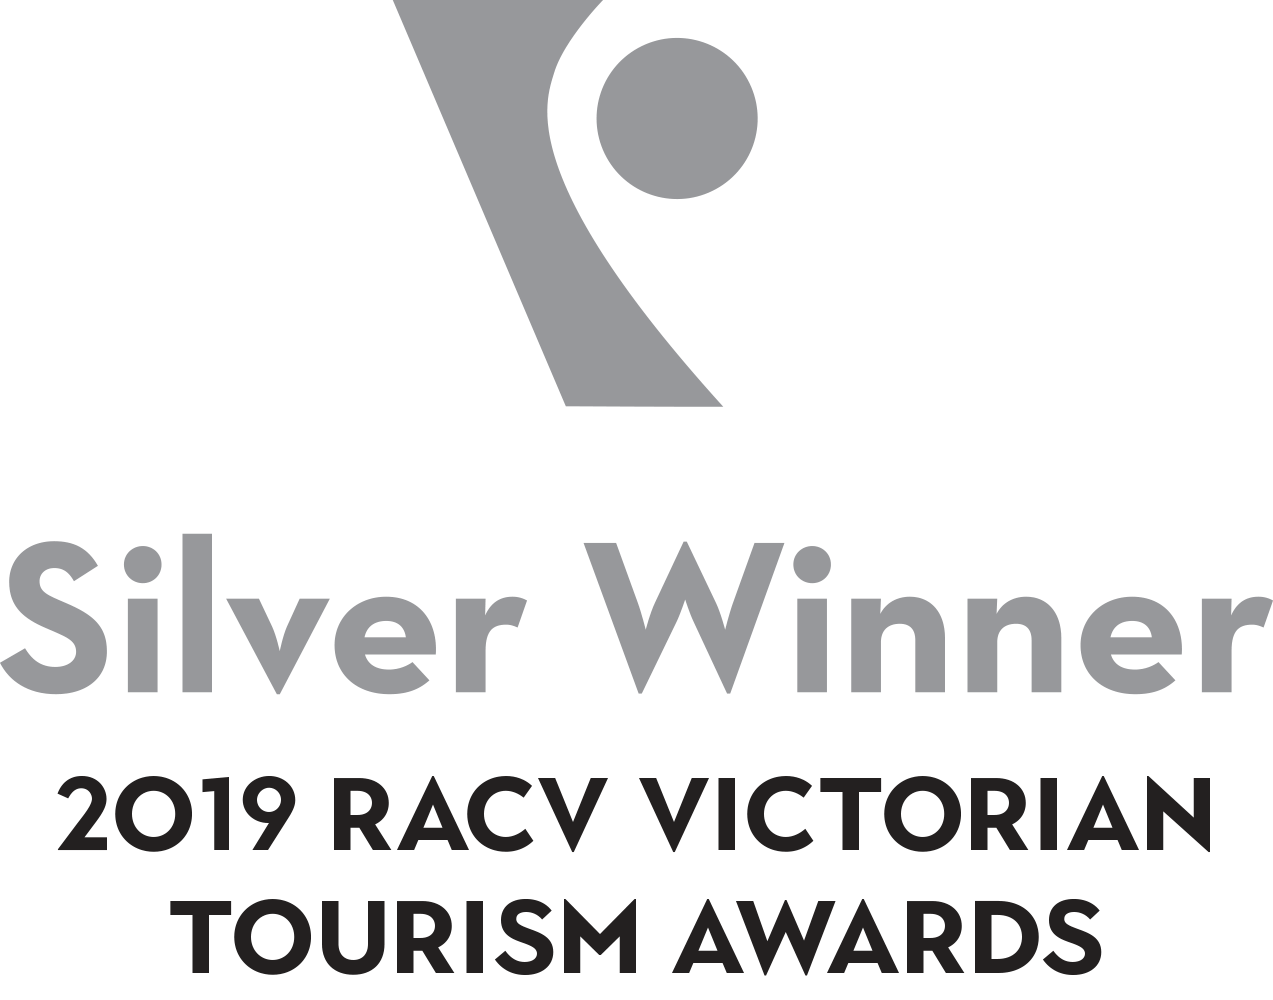 2019 Victorian Tourism Awards